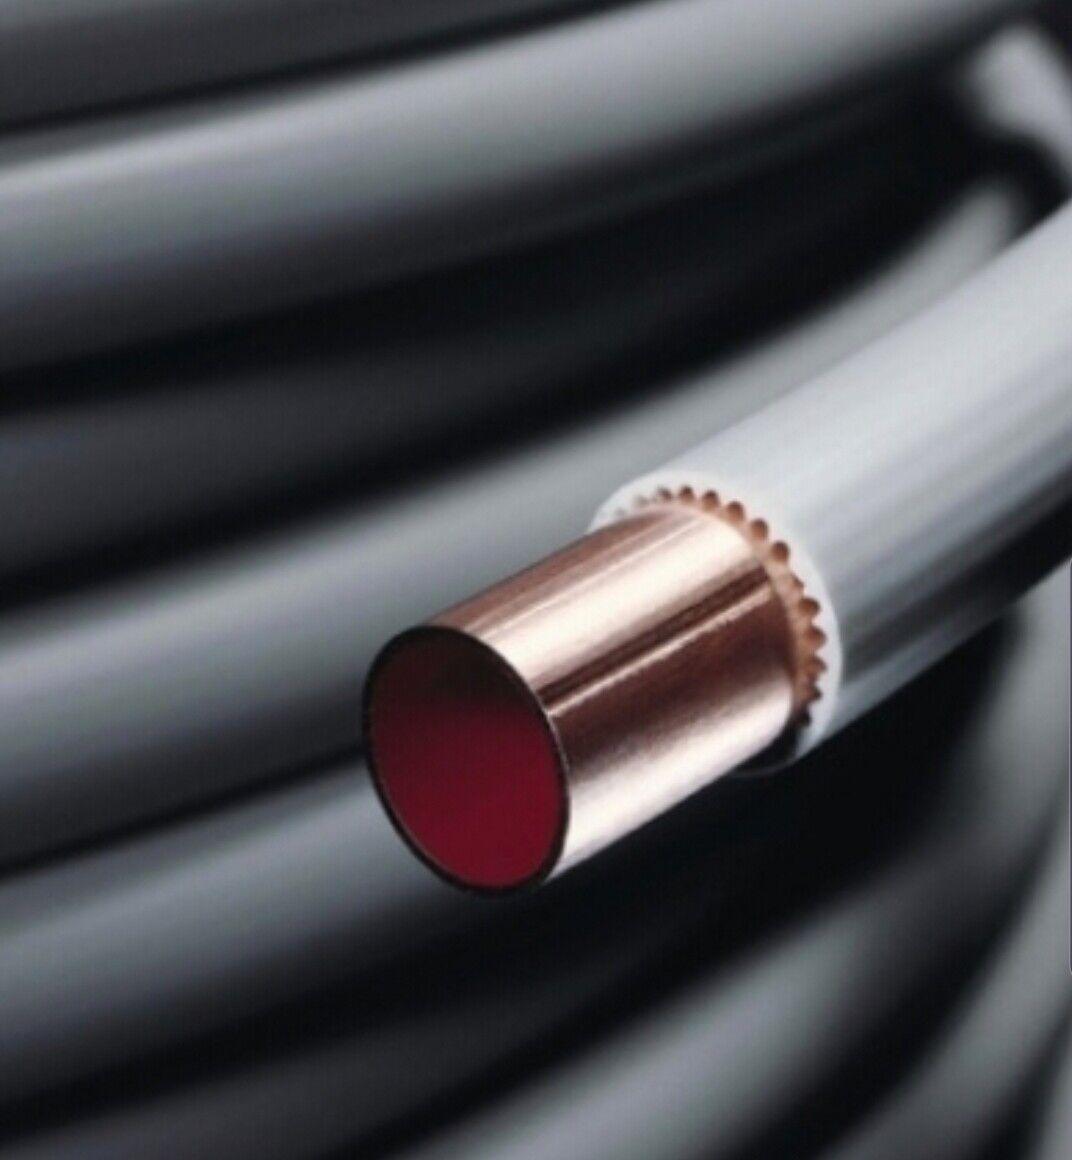 25m weich 15mm x 1mm Kupferrohr Ring a